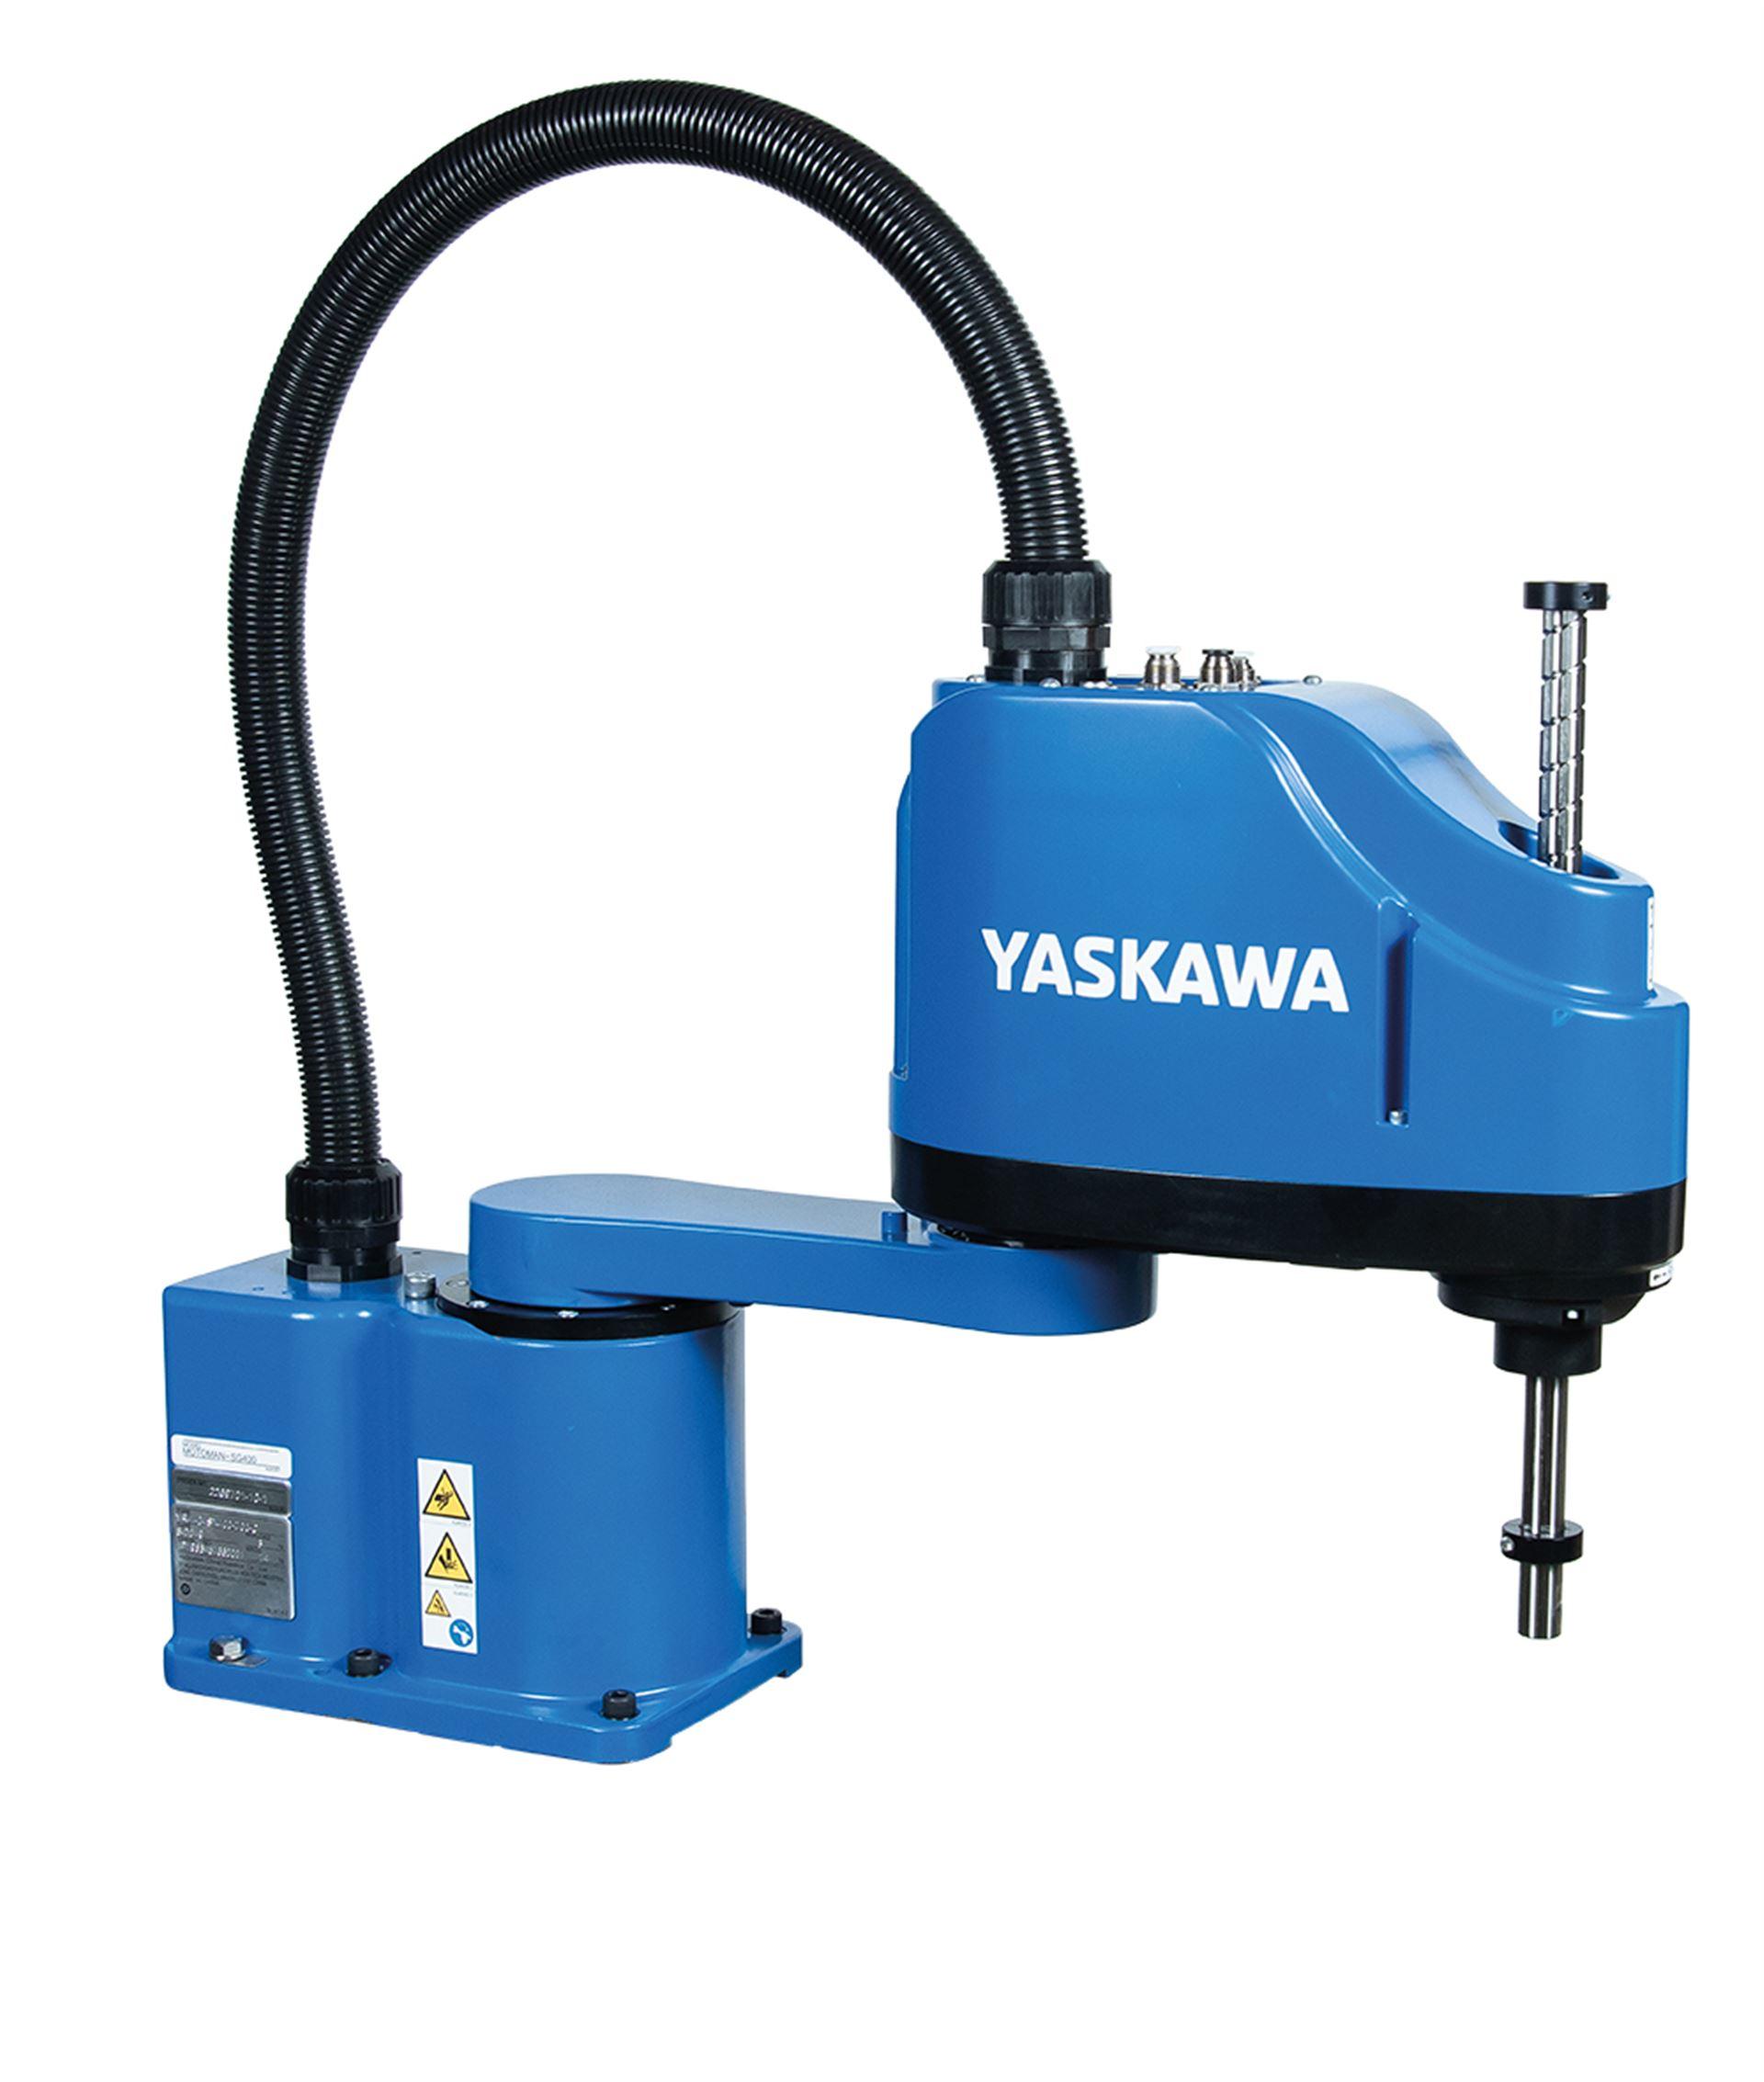 Blitzschnelle Scara-Roboter MOTOMAN SG400 und MOTOMAN SG650 von Yaskawa